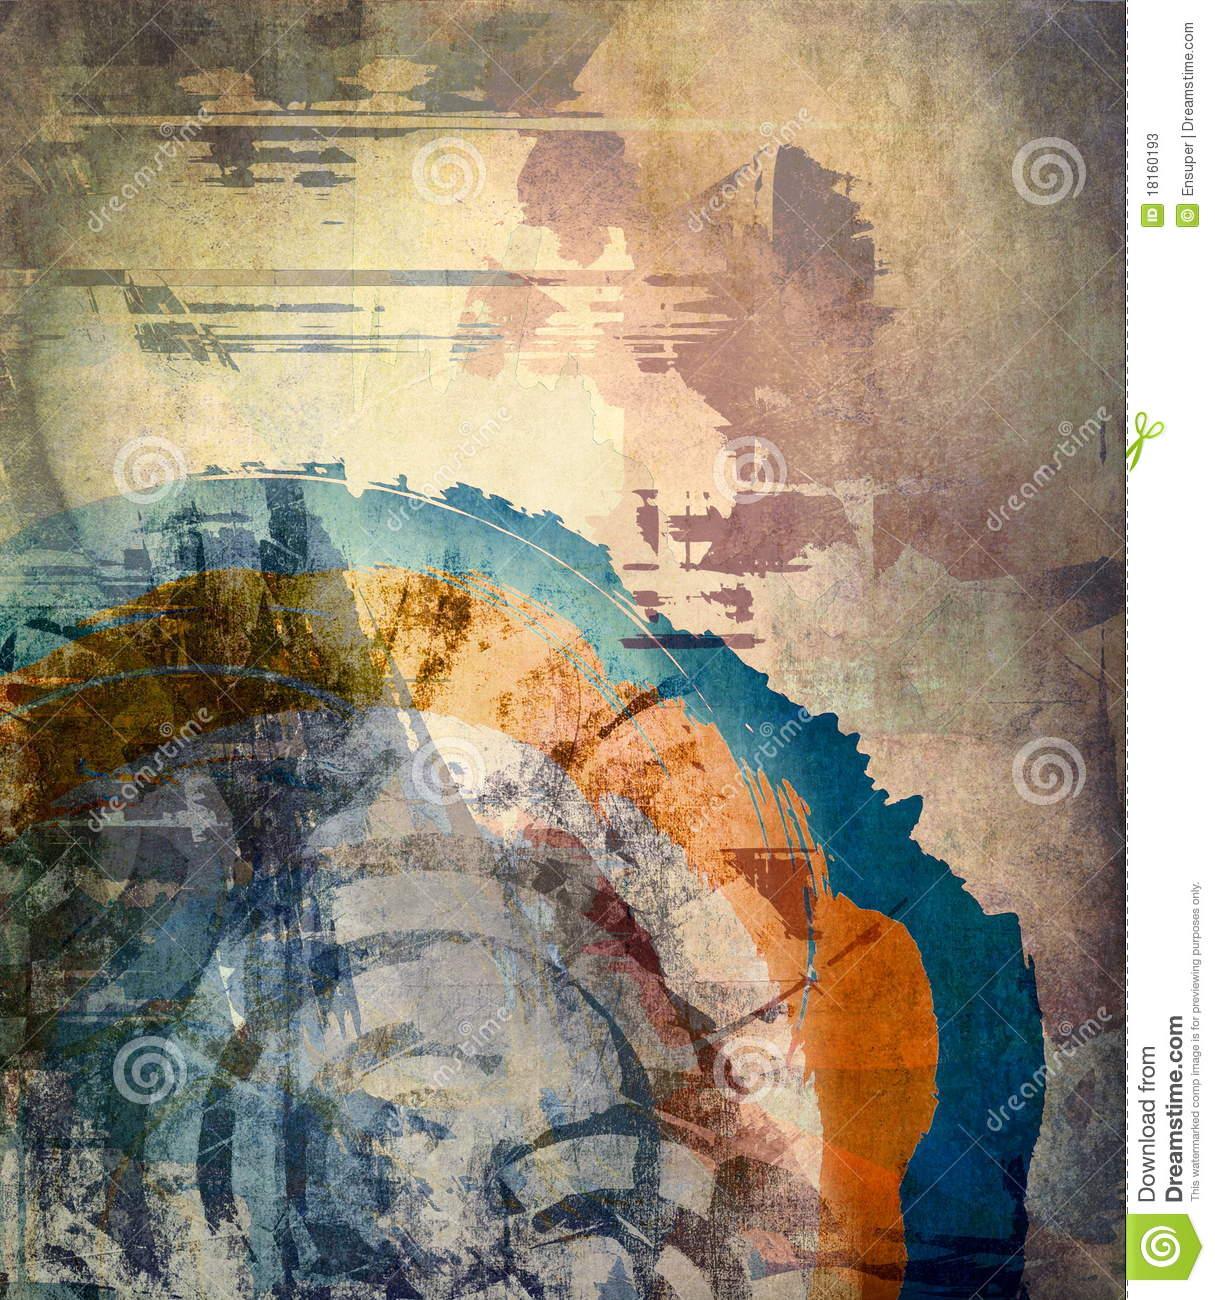 HQ Grunge Art Wallpapers | File 298.92Kb